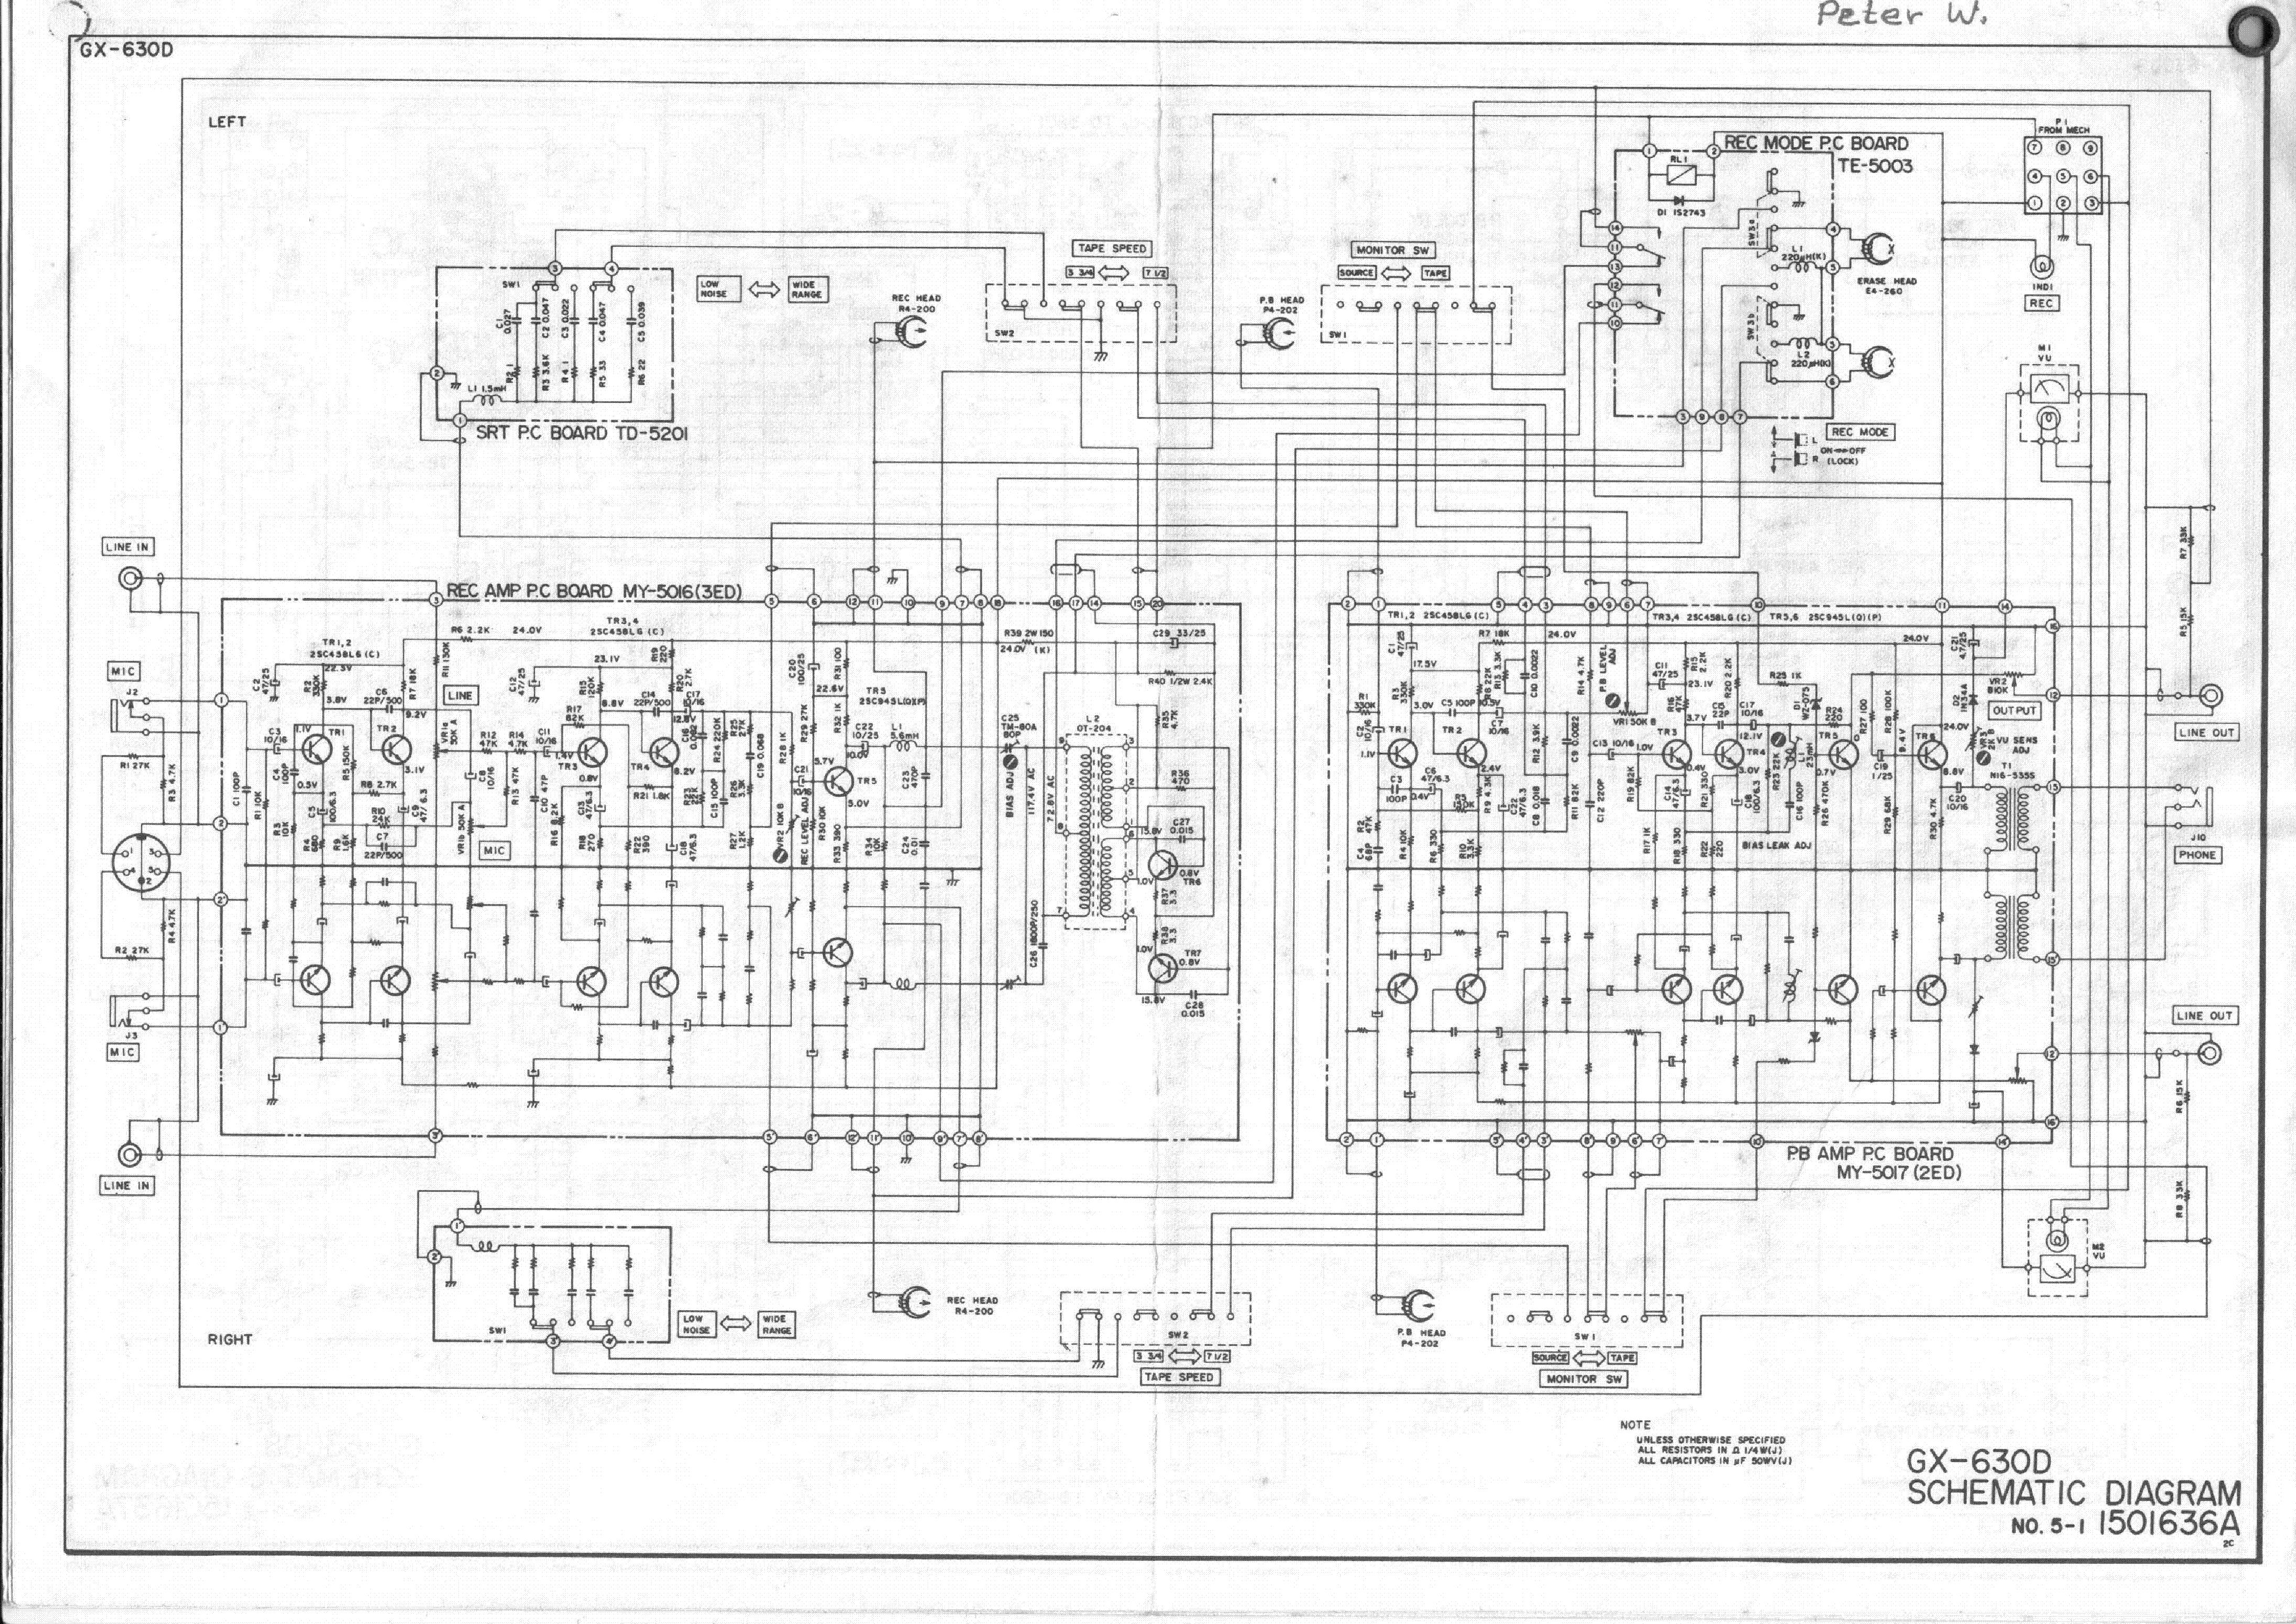 akai gx-635d инструкция